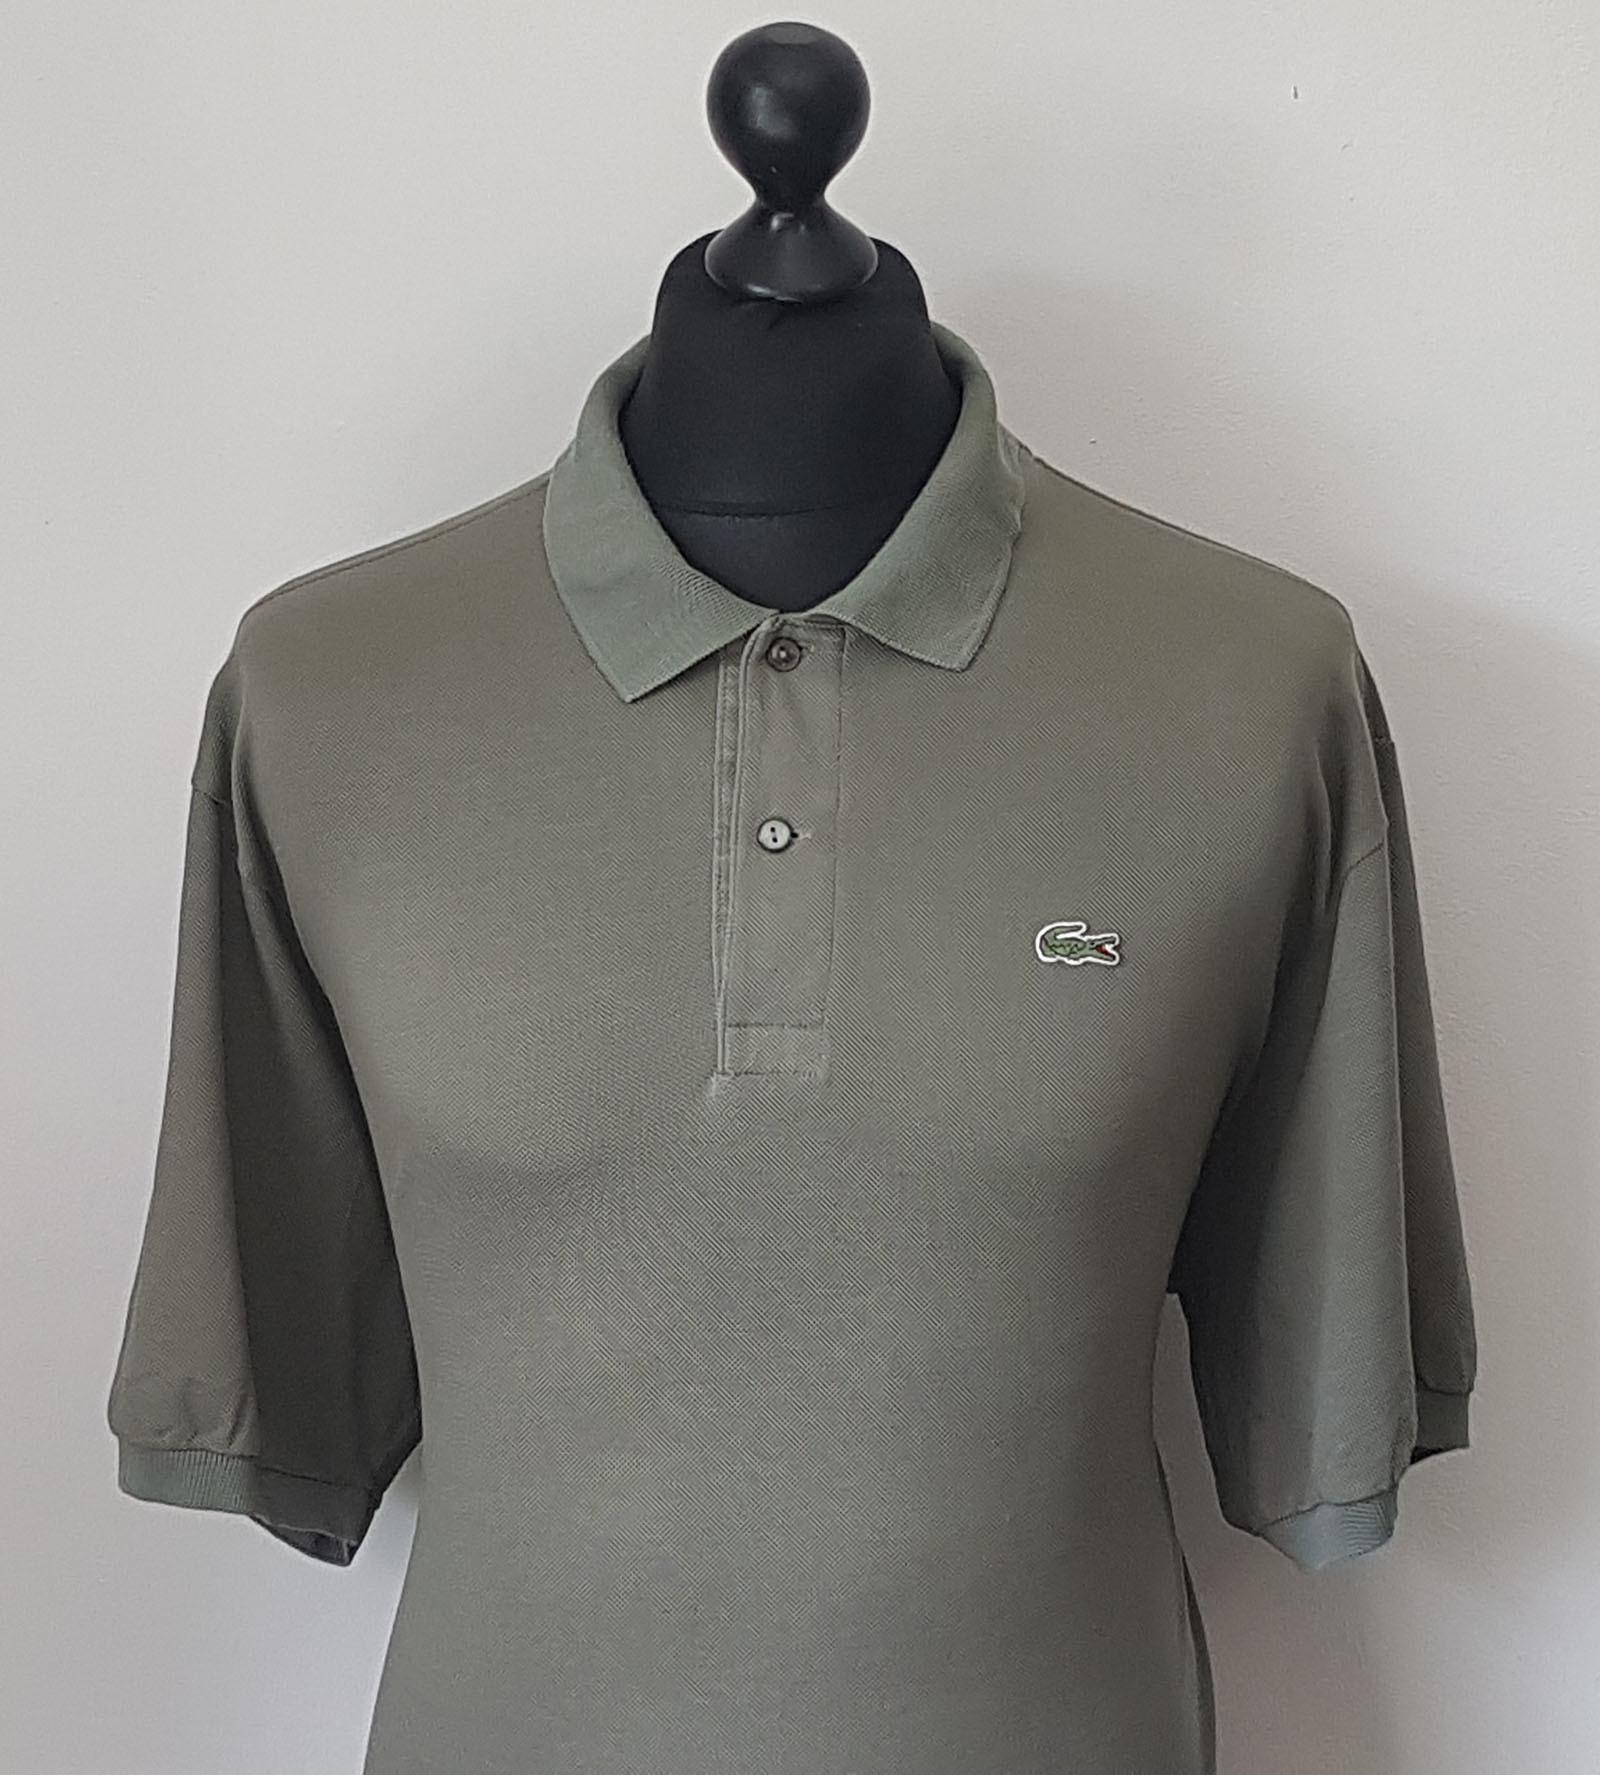 Lacoste men 39 s vintage dark green polo shirt size 8 xxl for Lacoste polo shirts ebay